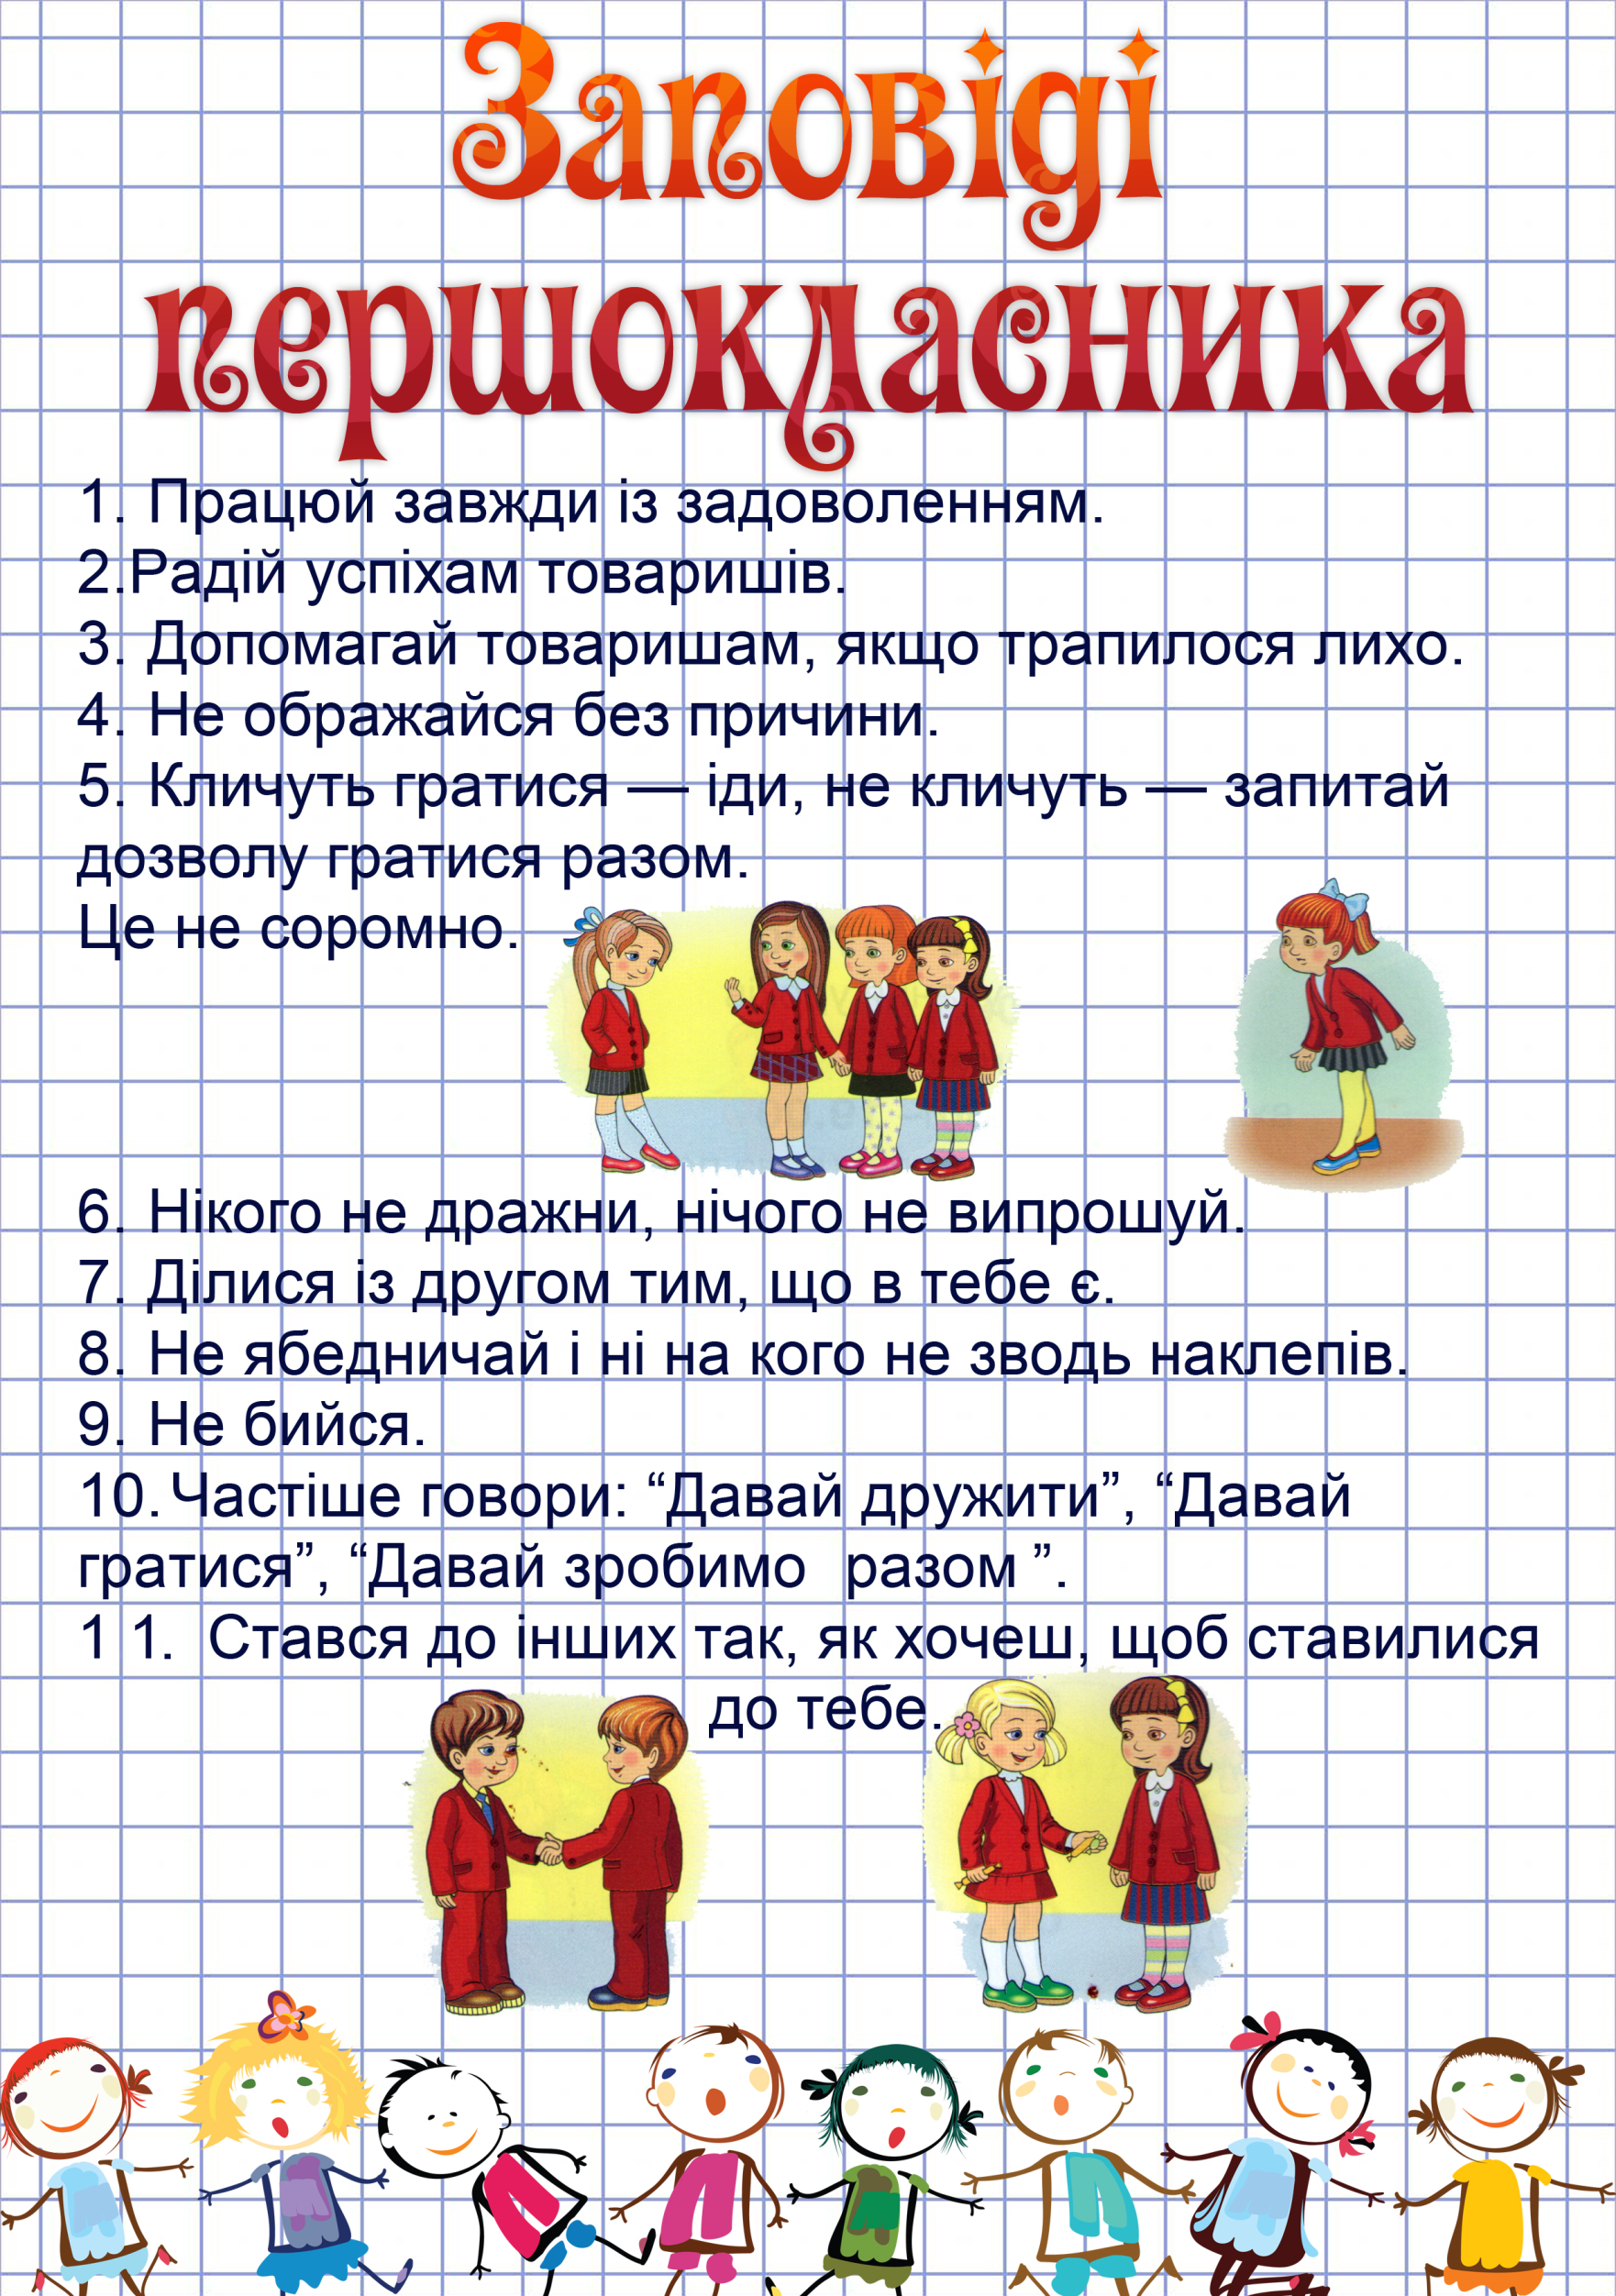 C:\Documents and Settings\Андрей\Мои документы\Мои рисунки\Безымянный 6.bmp